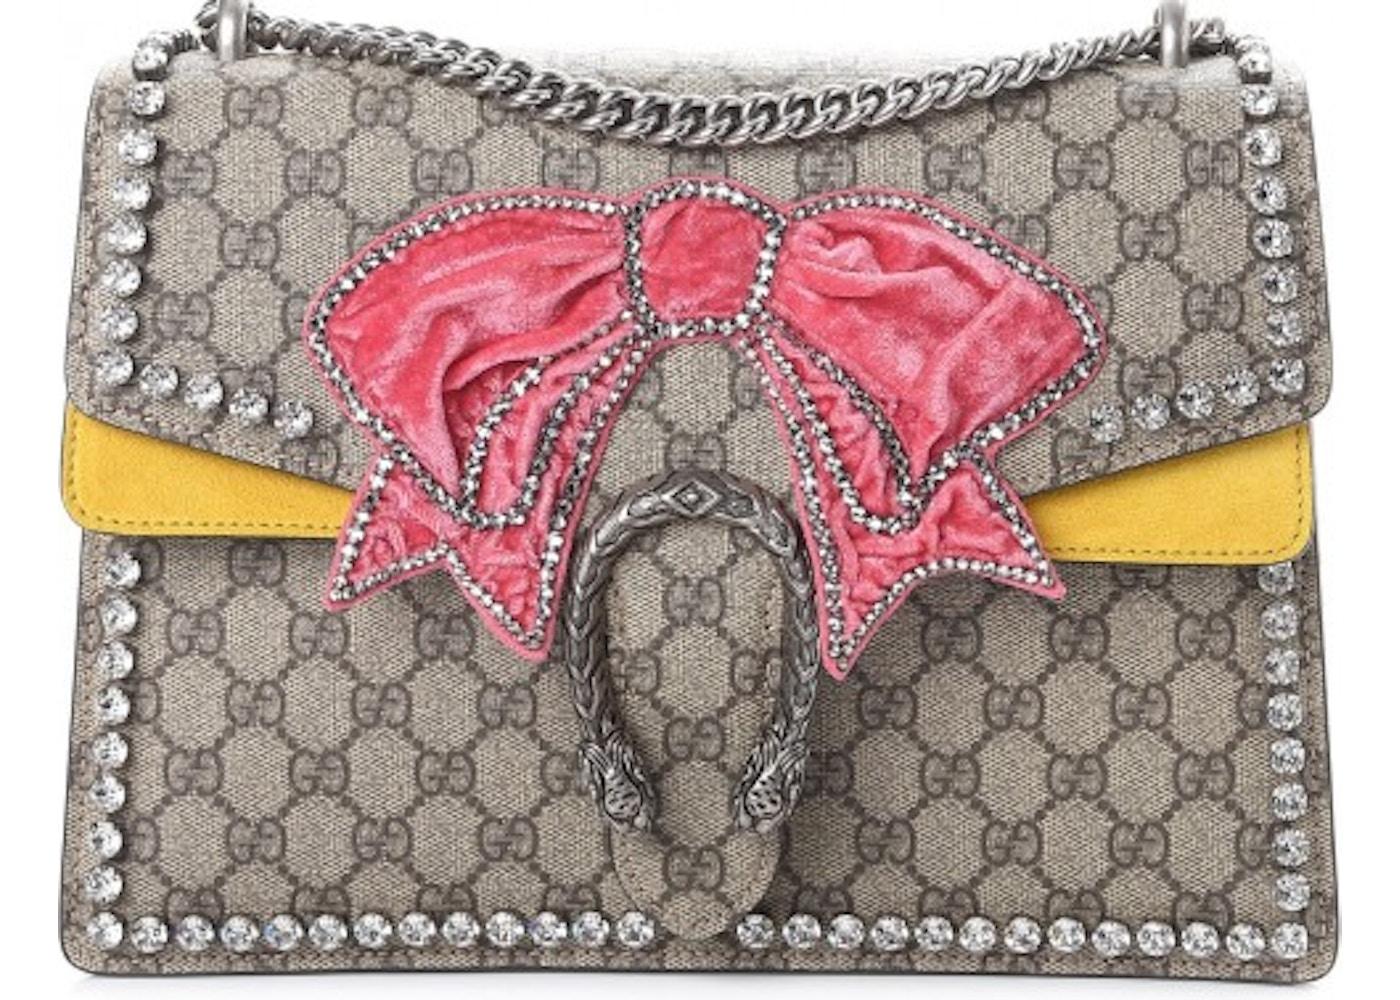 2c0665b331cd Gucci Dionysus Monogram GG Supreme Bow/Embroidered Crystal ...